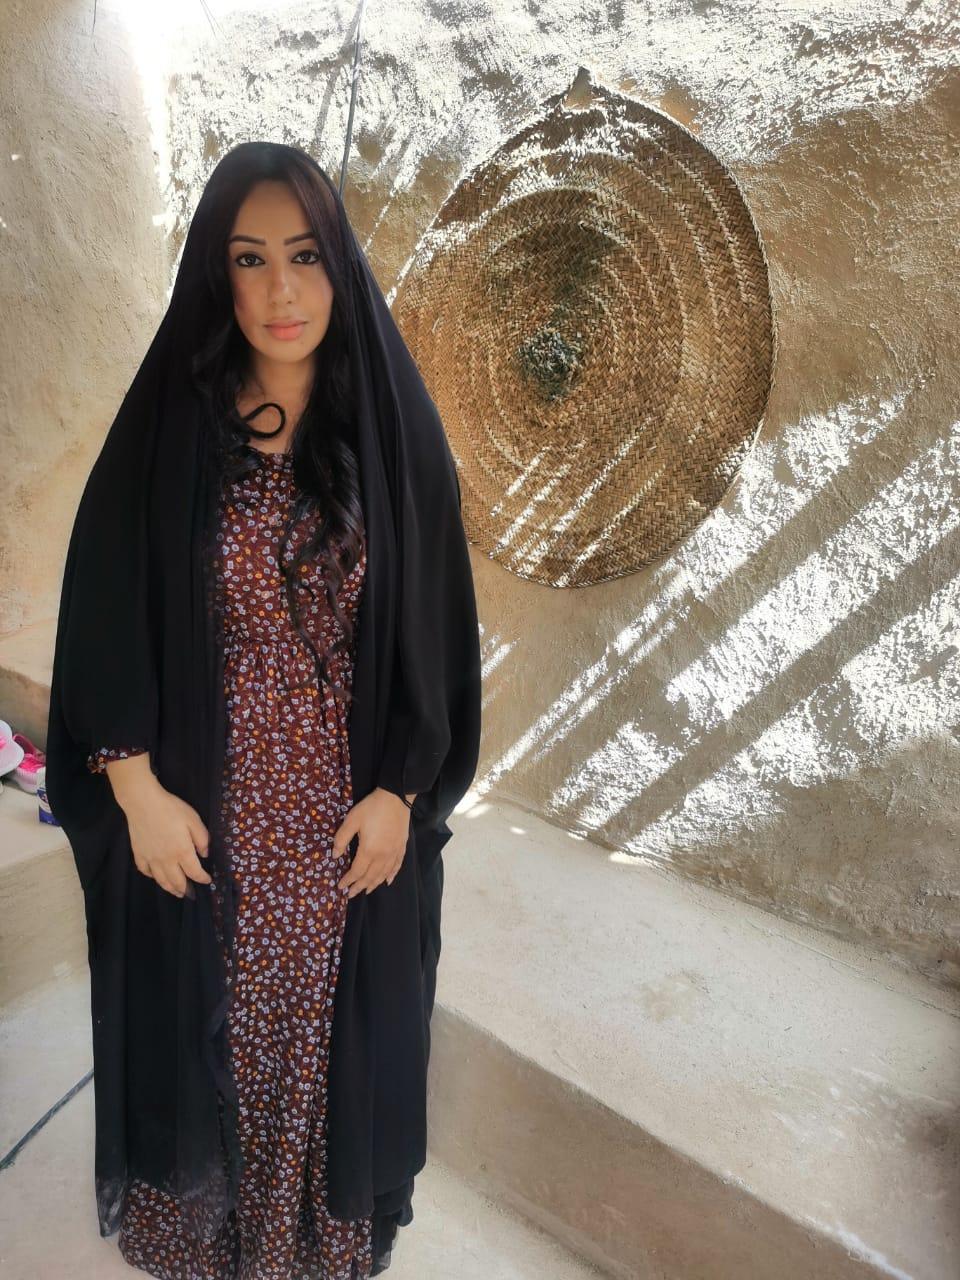 bfc27b69 5d7e 4426 ab4e 640568c3bc41 - دراما جديدة للفنانة رشا السيد في شهر رمضان المبارك